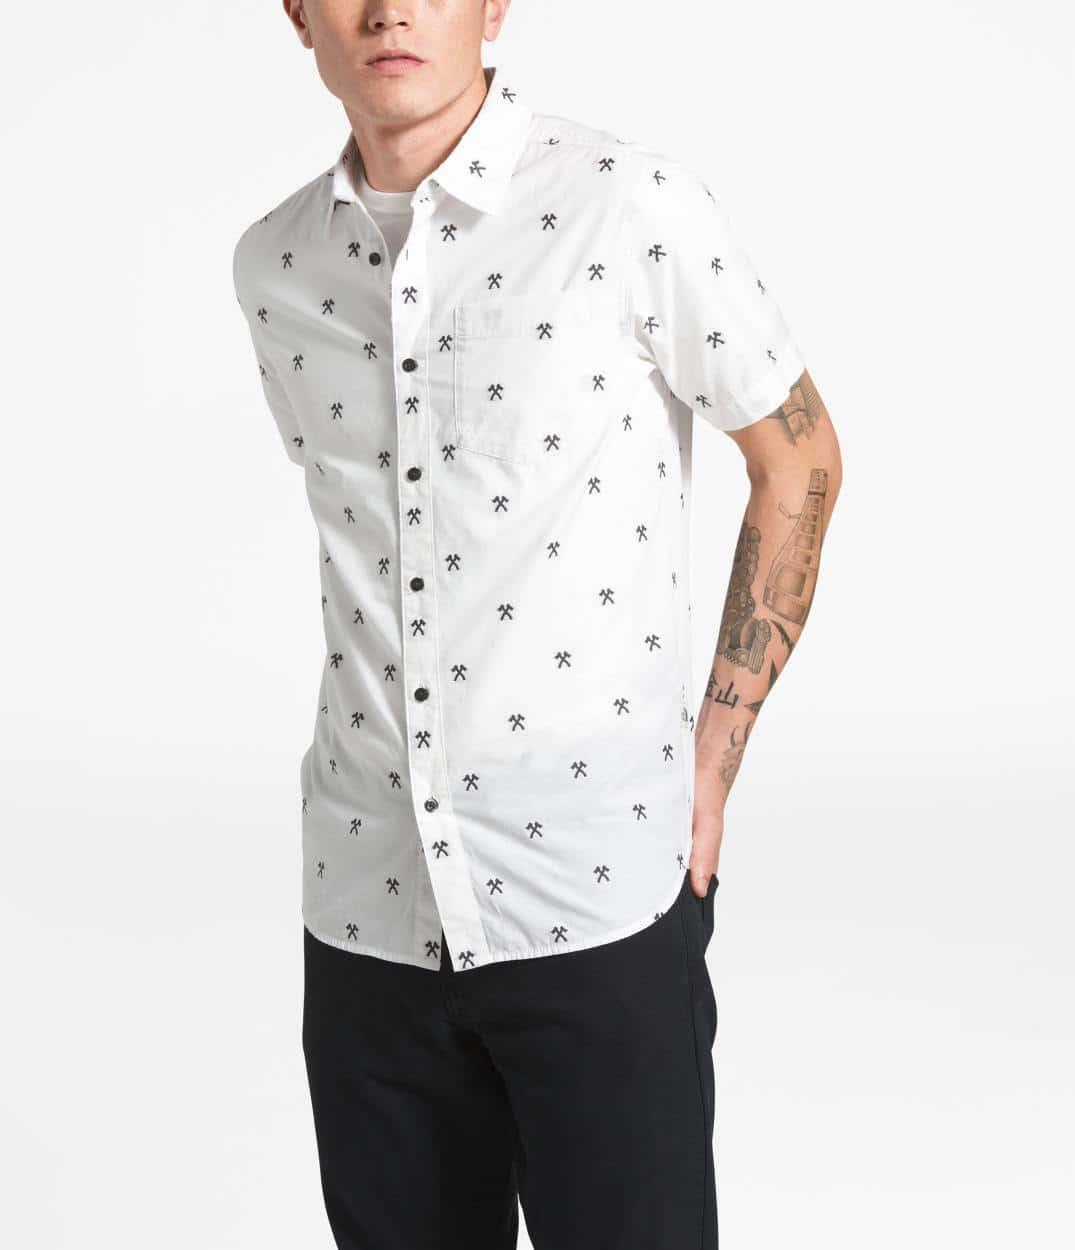 983e96842 Short-Sleeve Bay Trail Jacquard Shirt - Men's